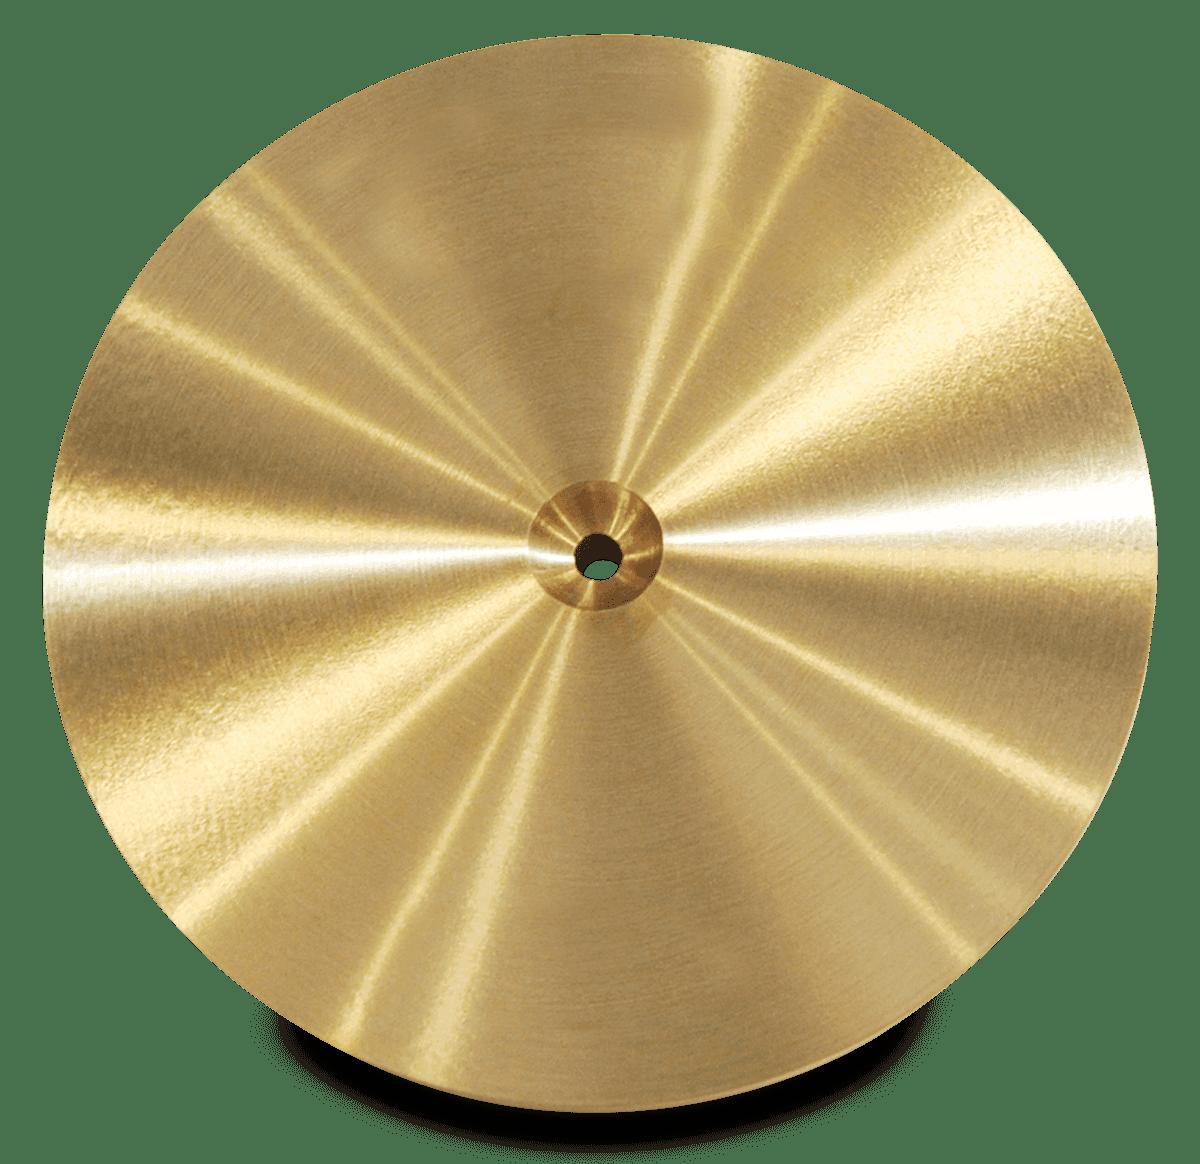 Zildjian CYMBALES D'ORCHESTRE P0612DDIESE